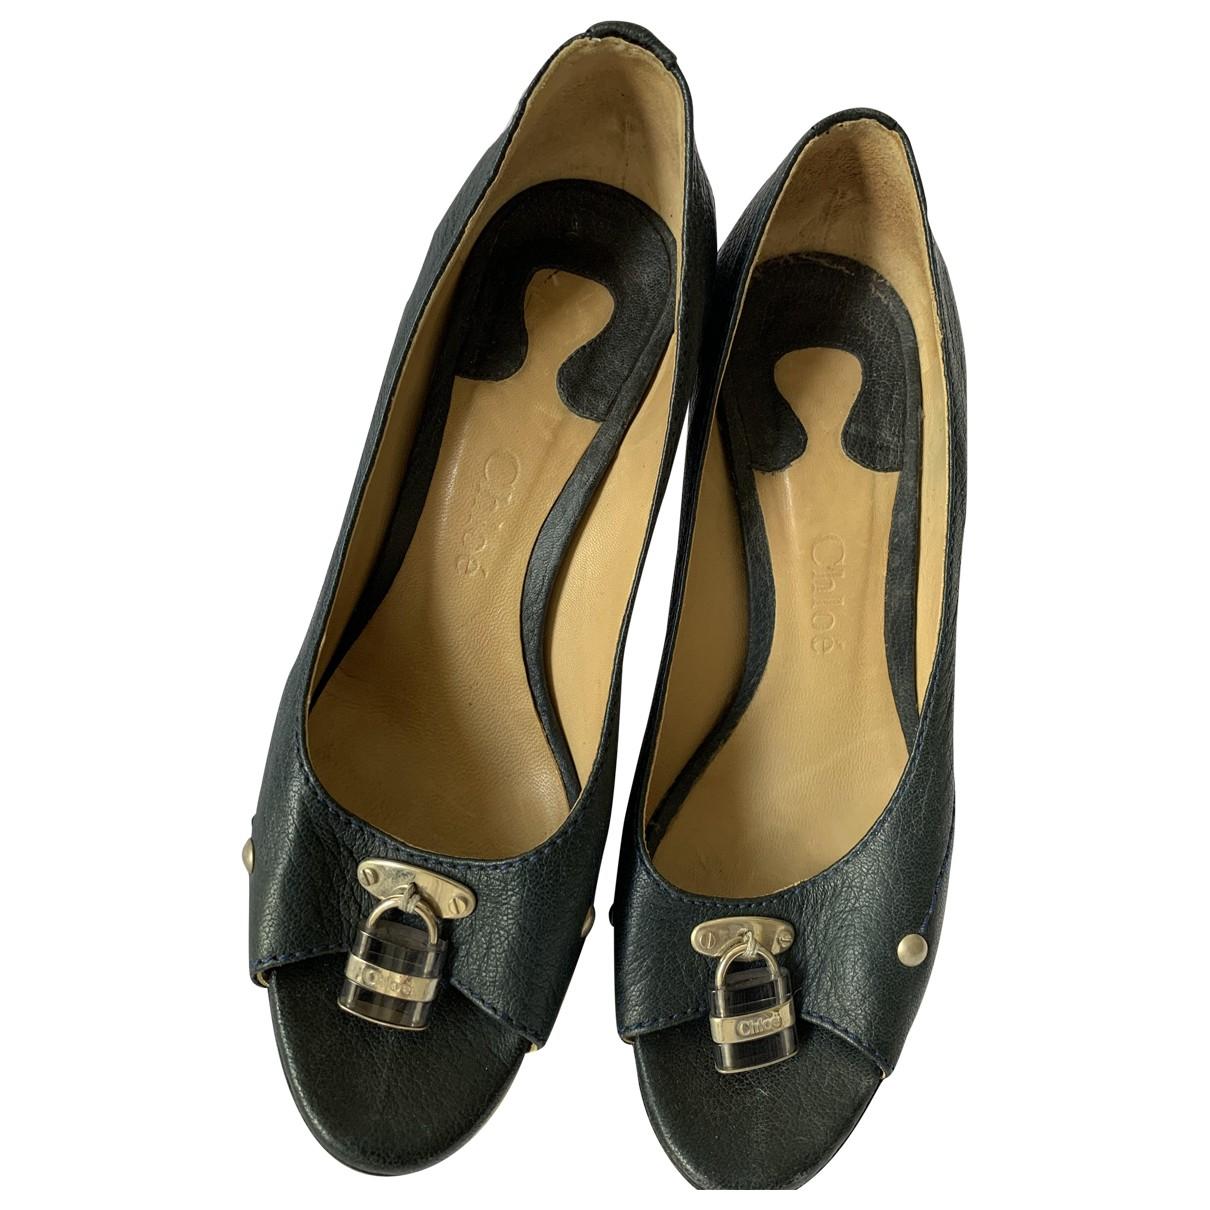 Chloé \N Navy Leather Heels for Women 37 EU